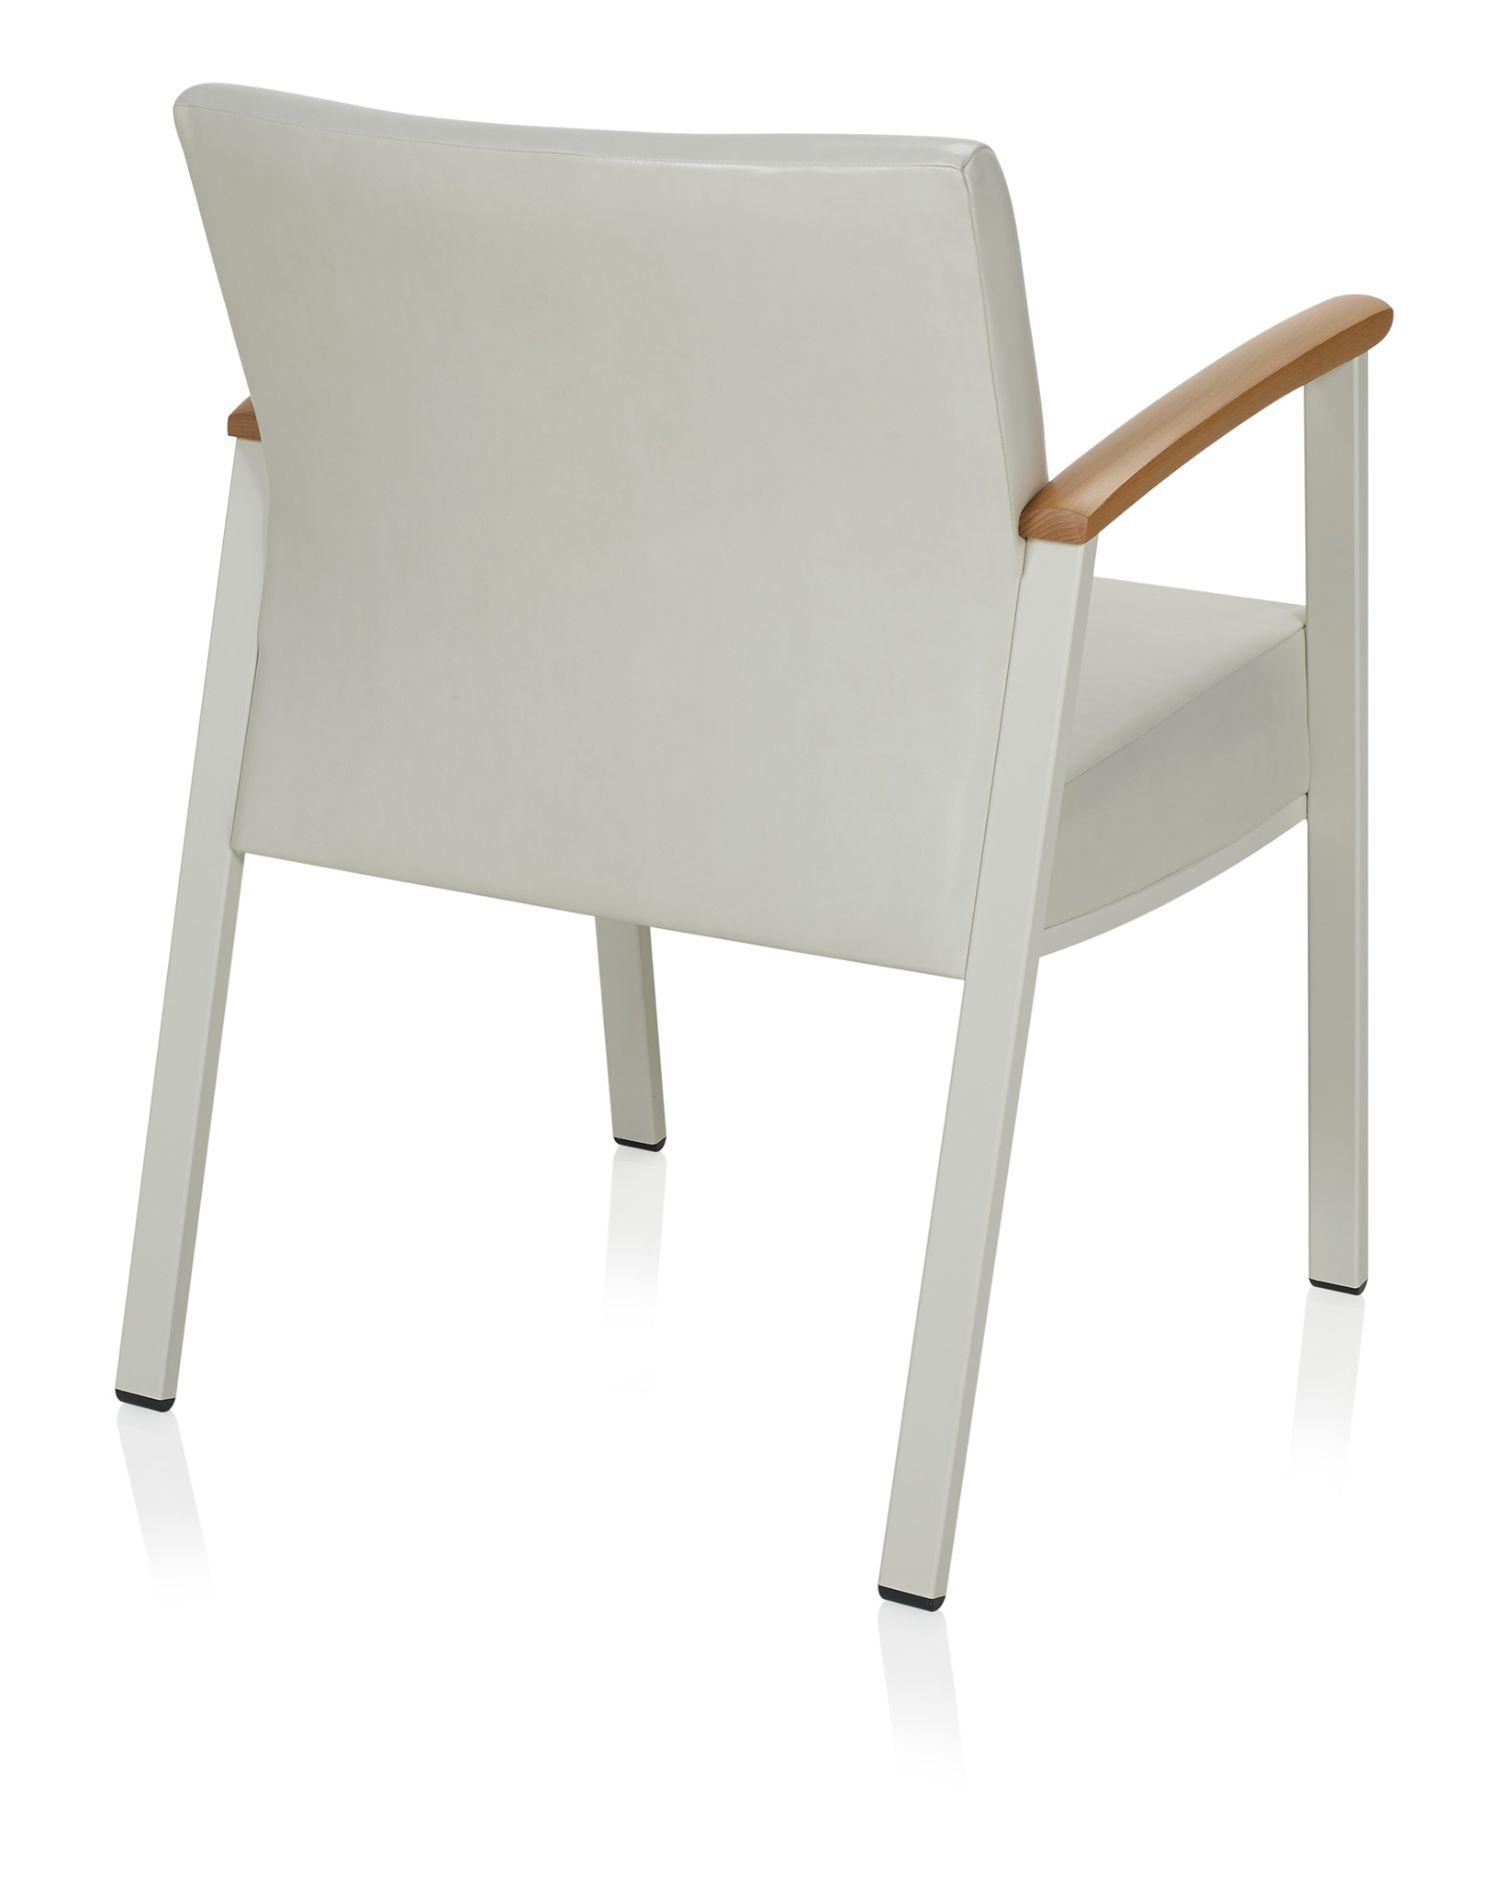 ki soltice metal seating